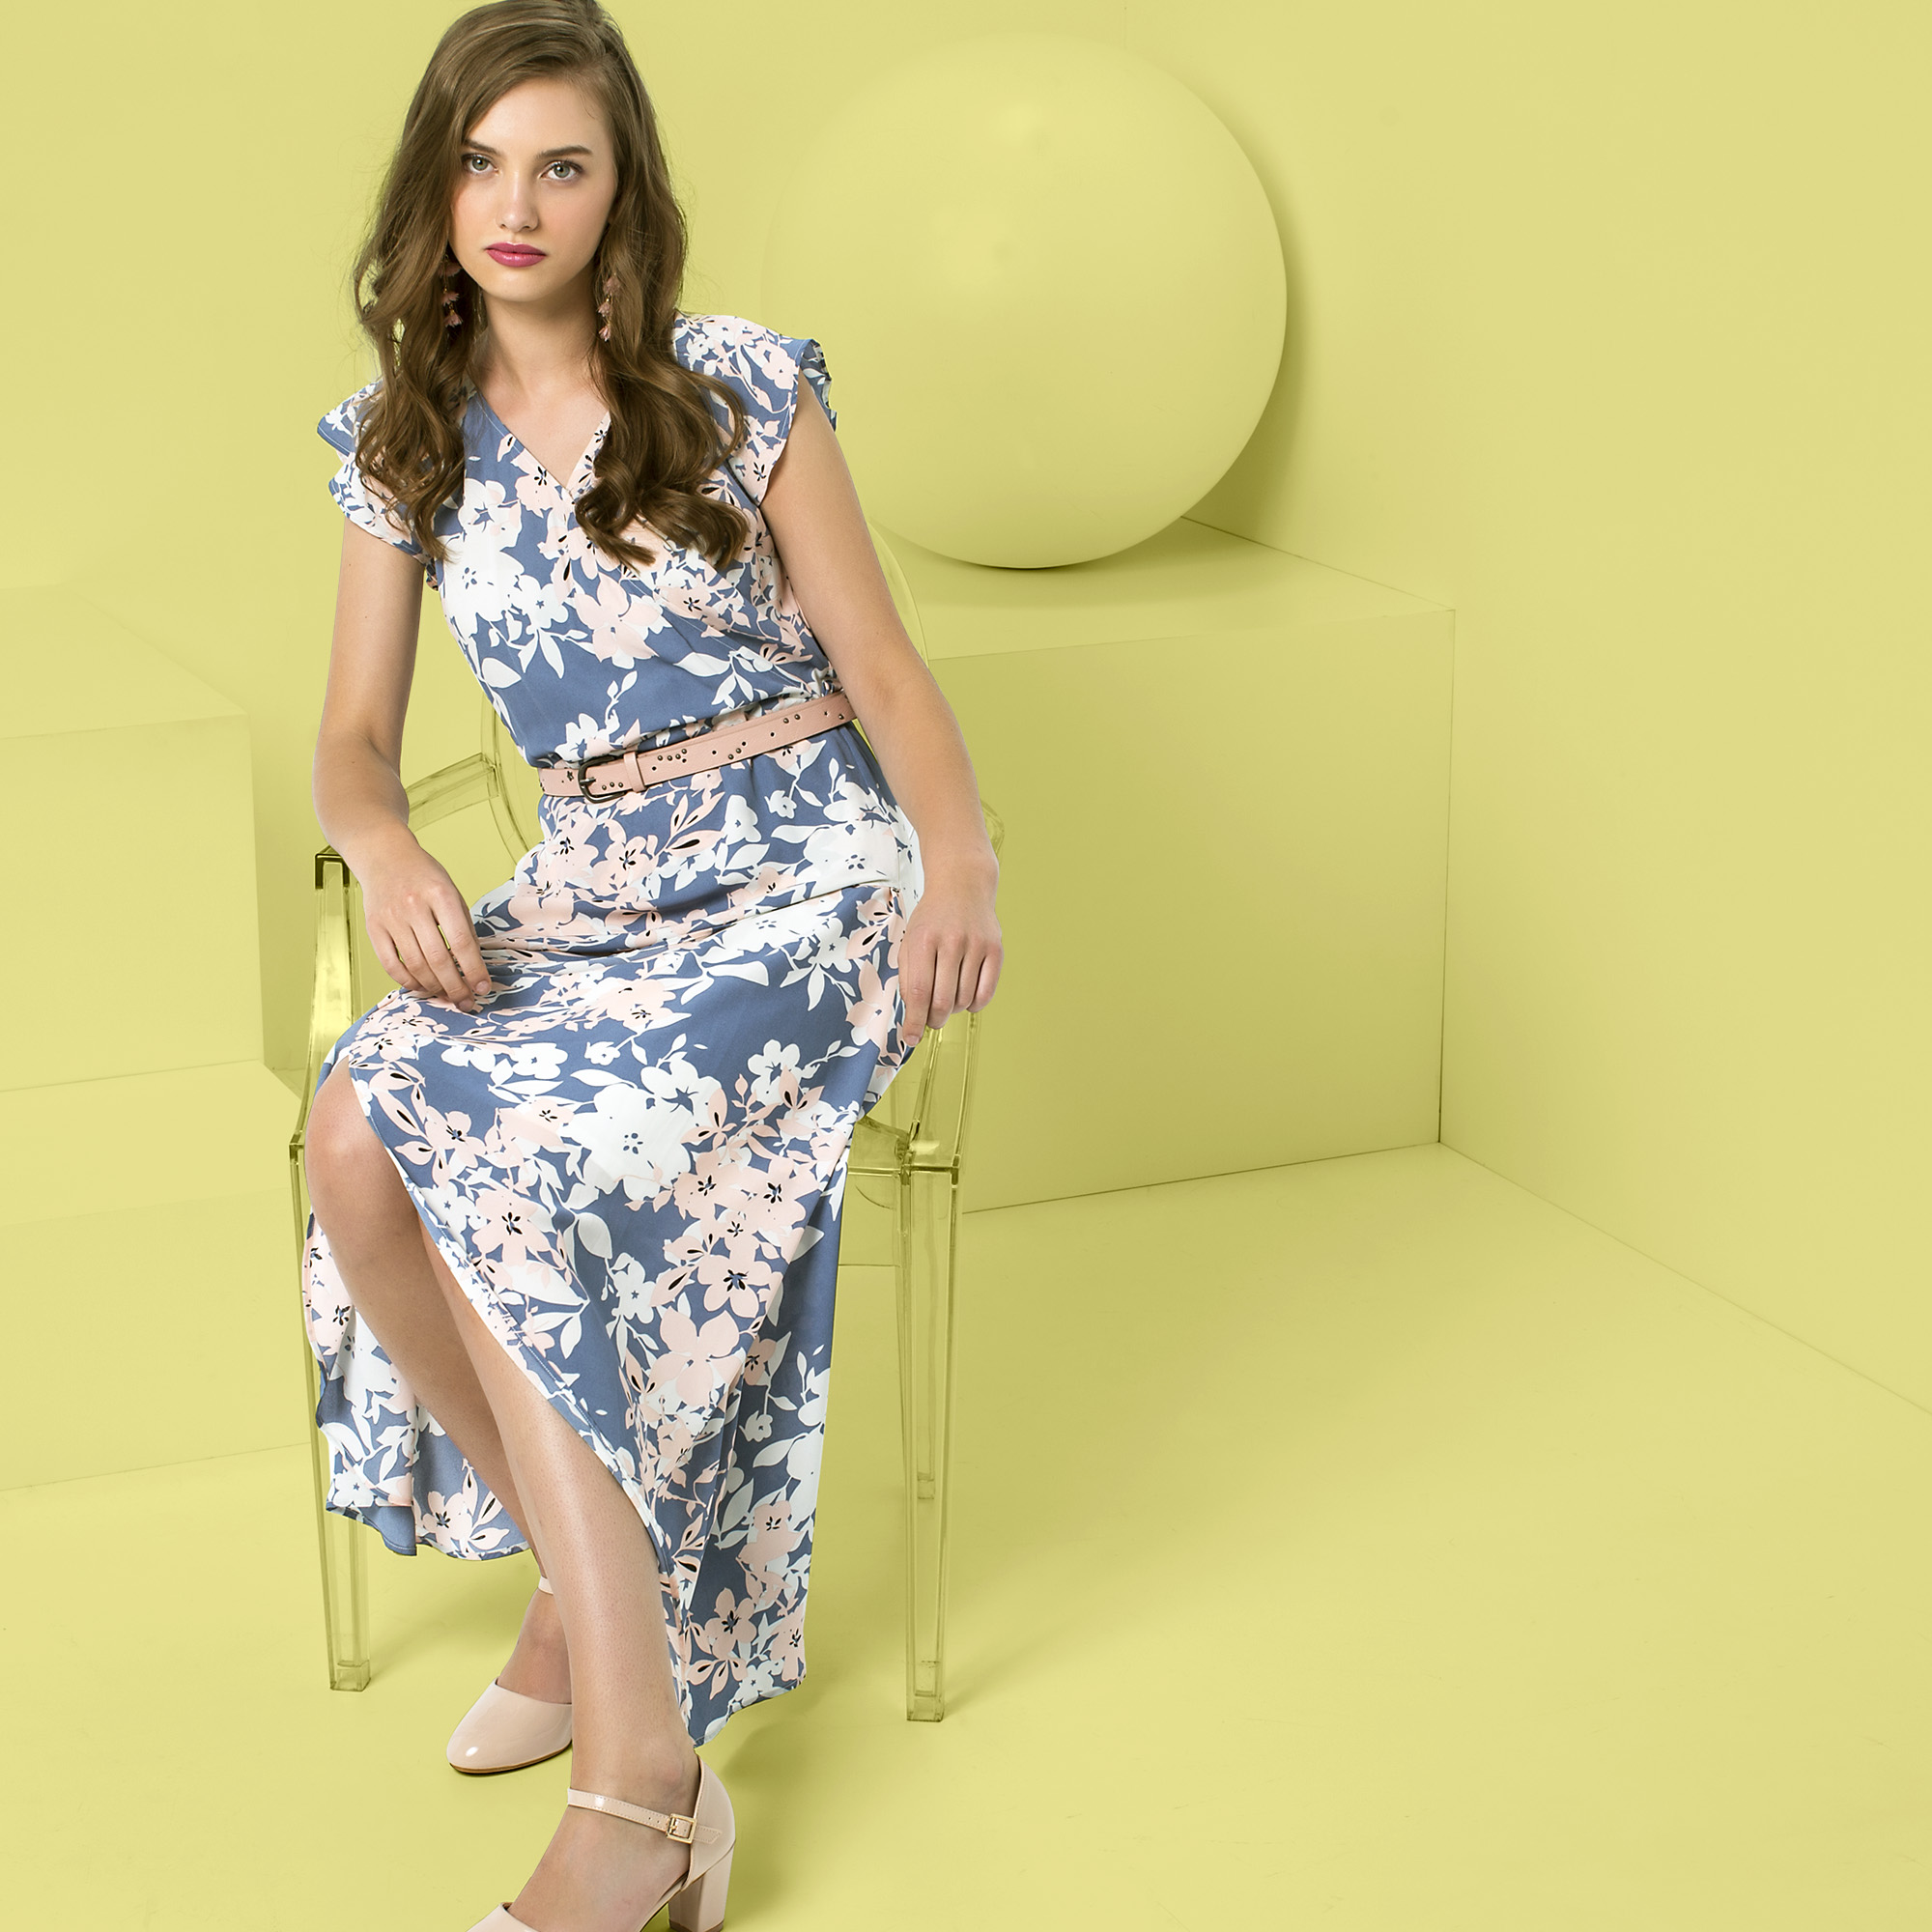 a woman wearing pastel dress